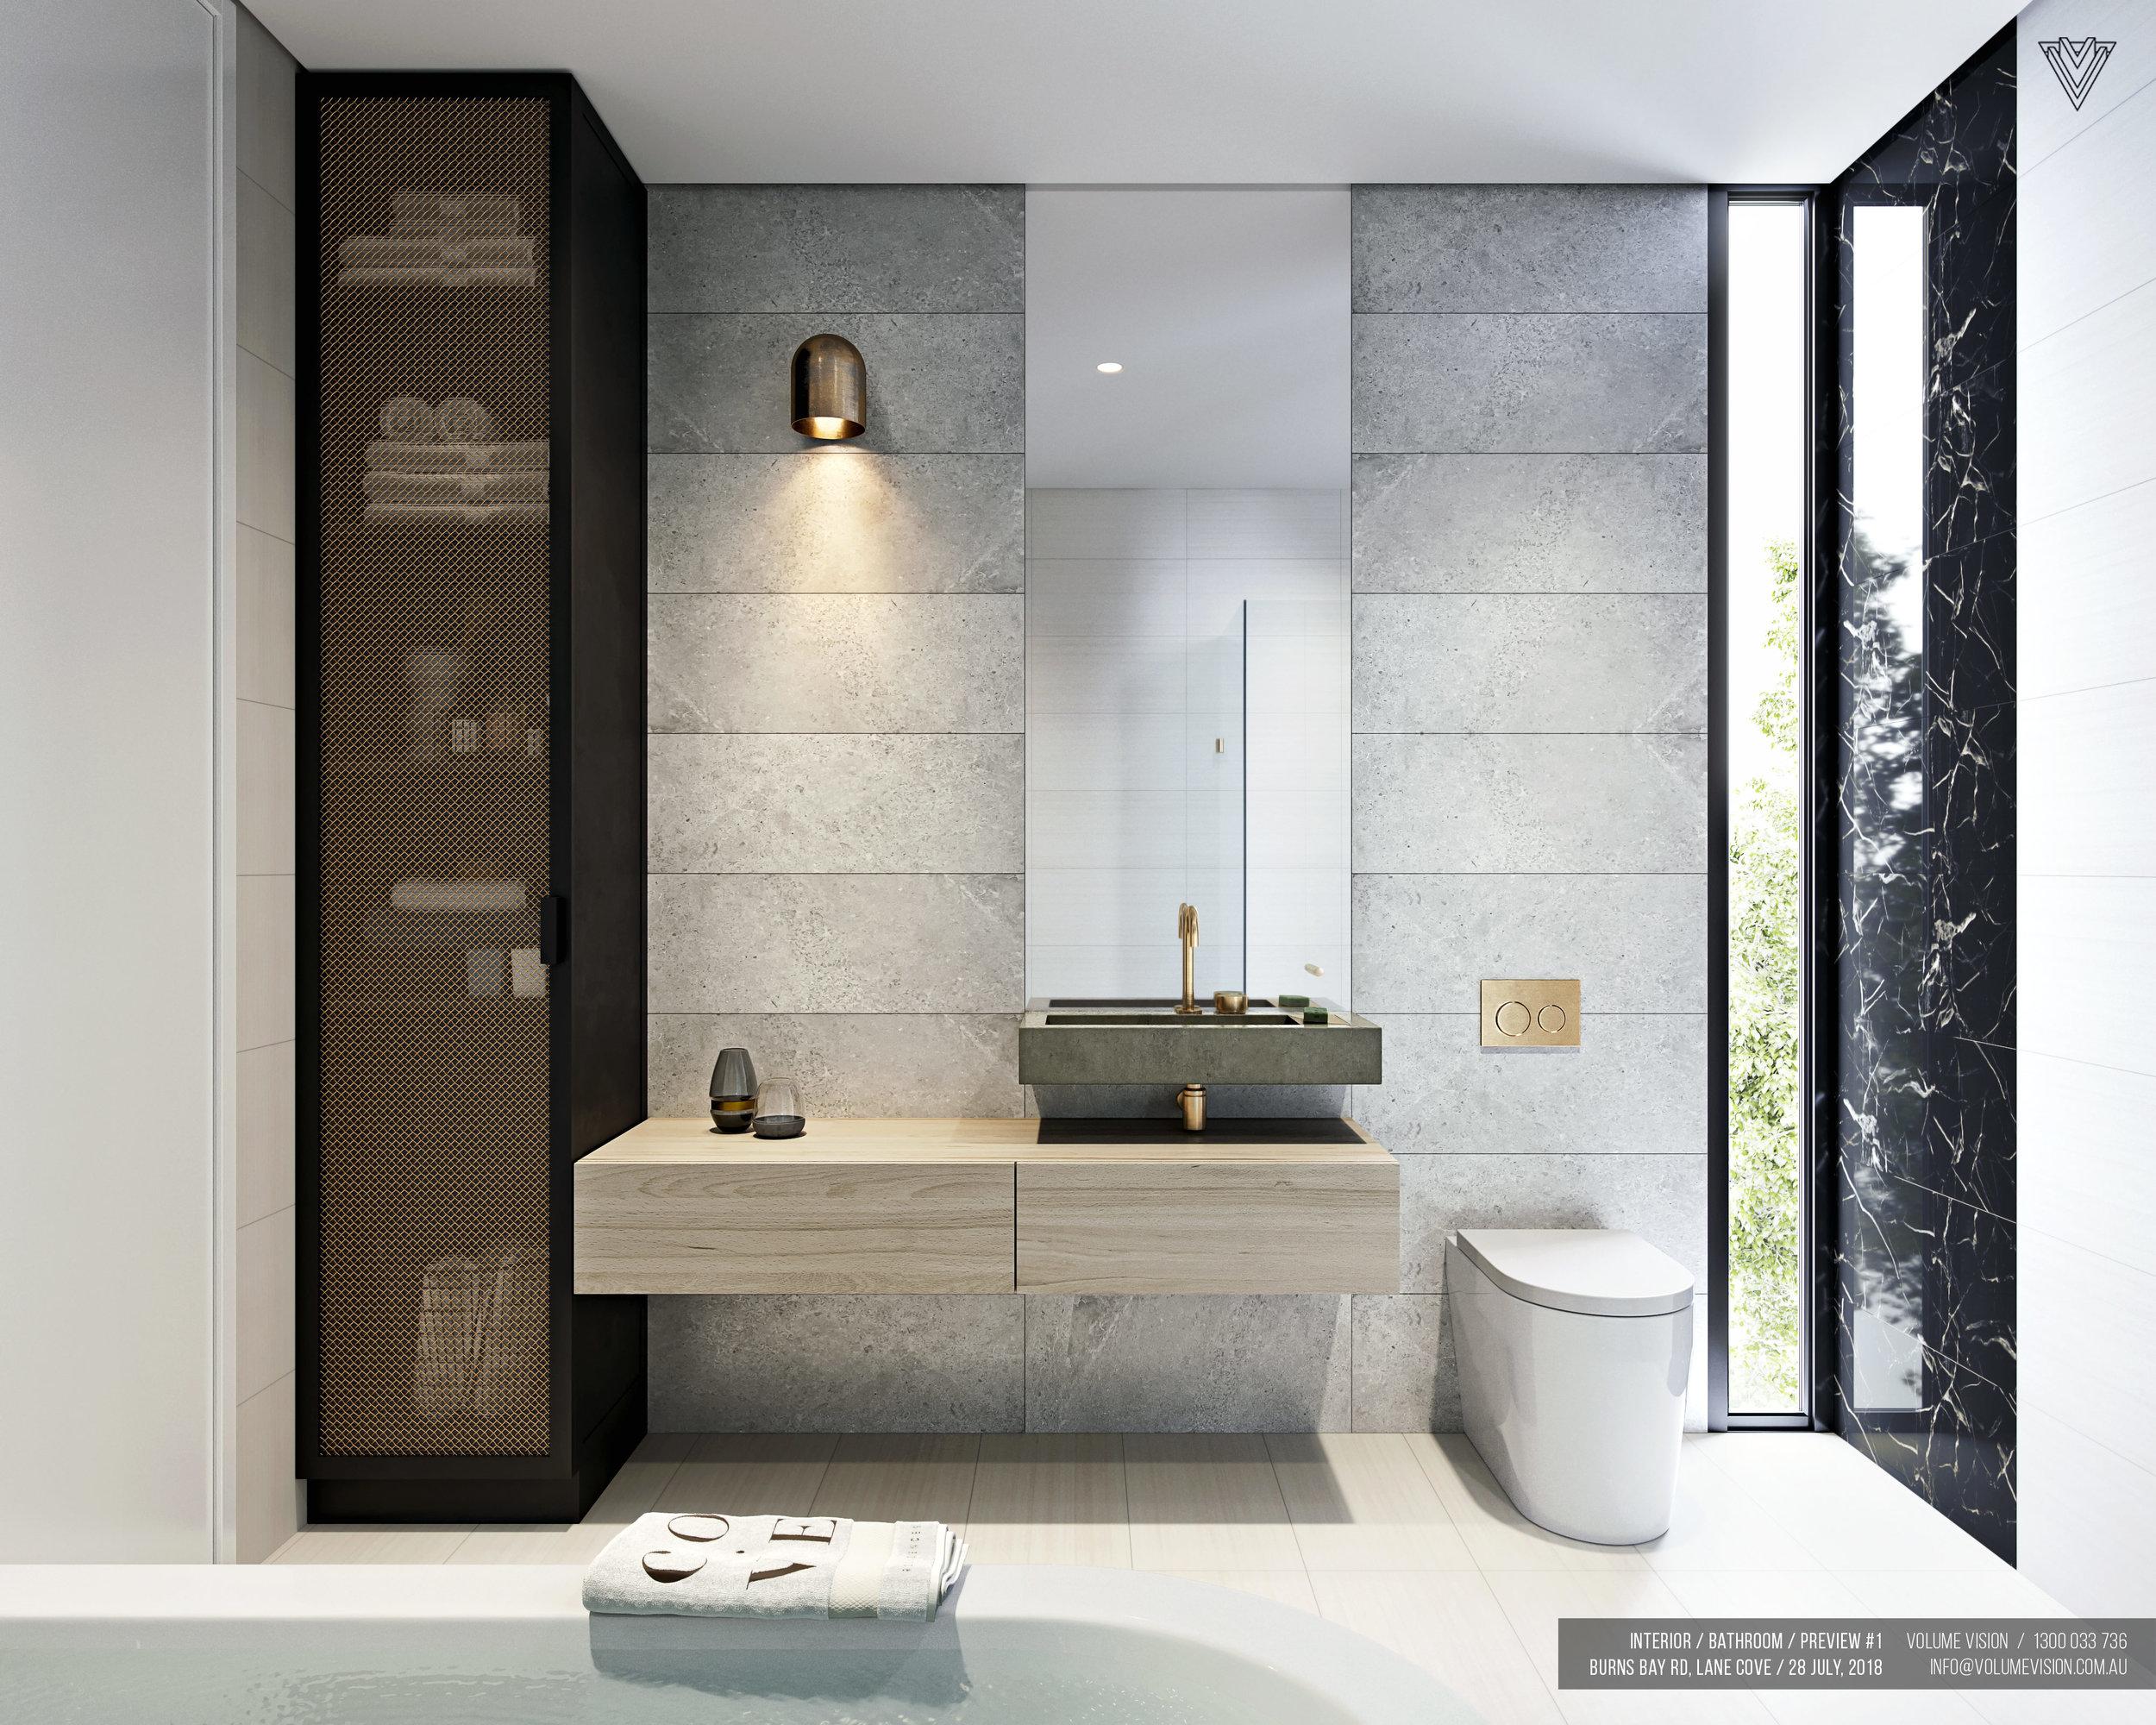 bathroom_burns_bay_rd_preview_#1.jpg